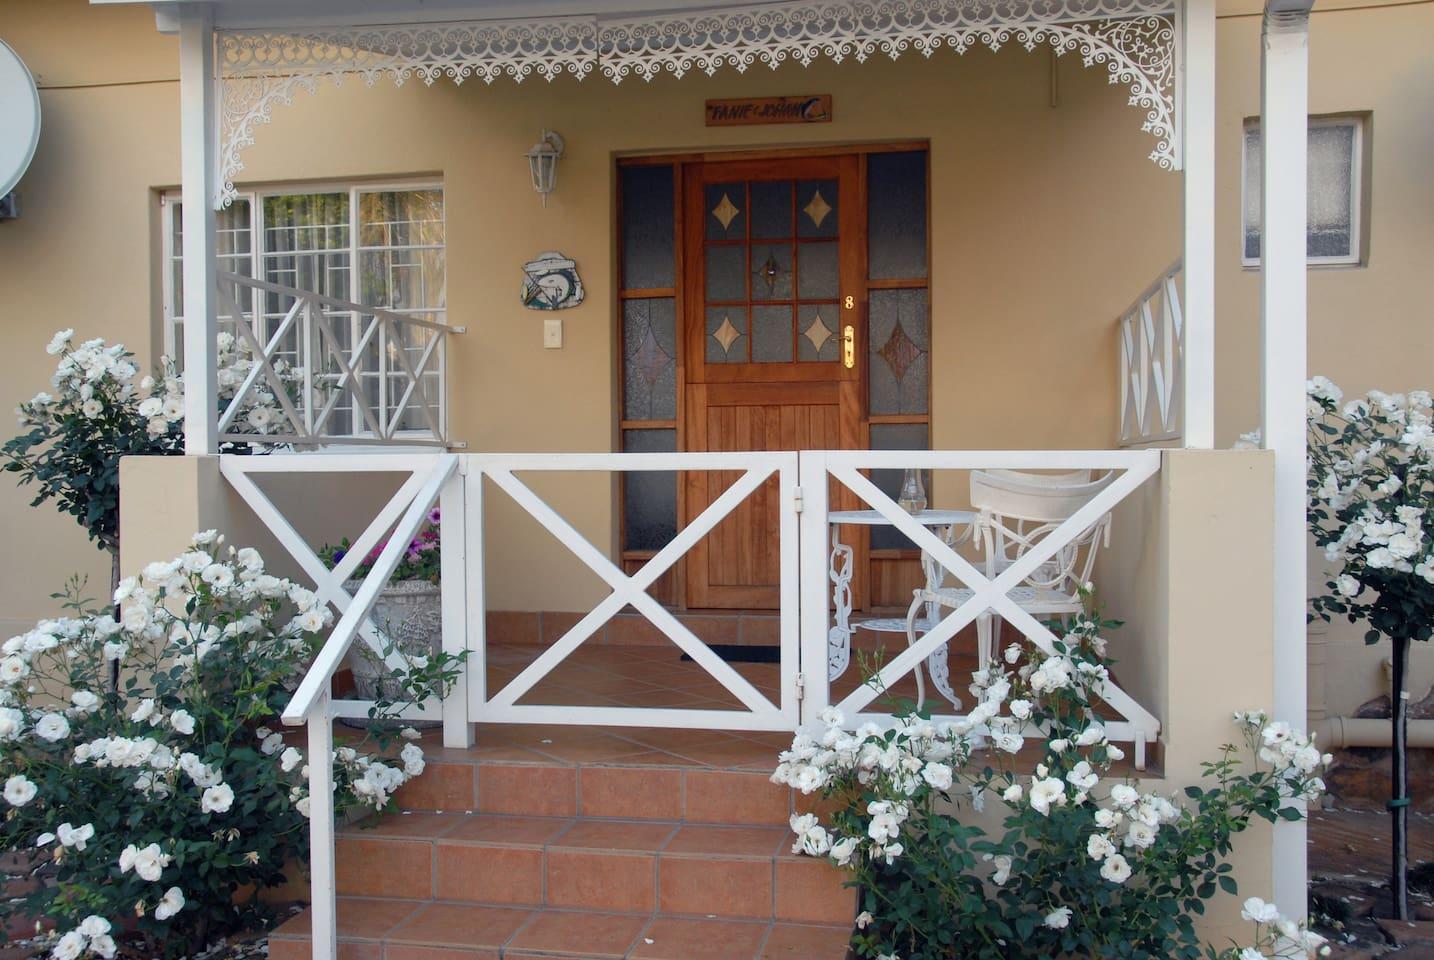 Private entrance with verandah